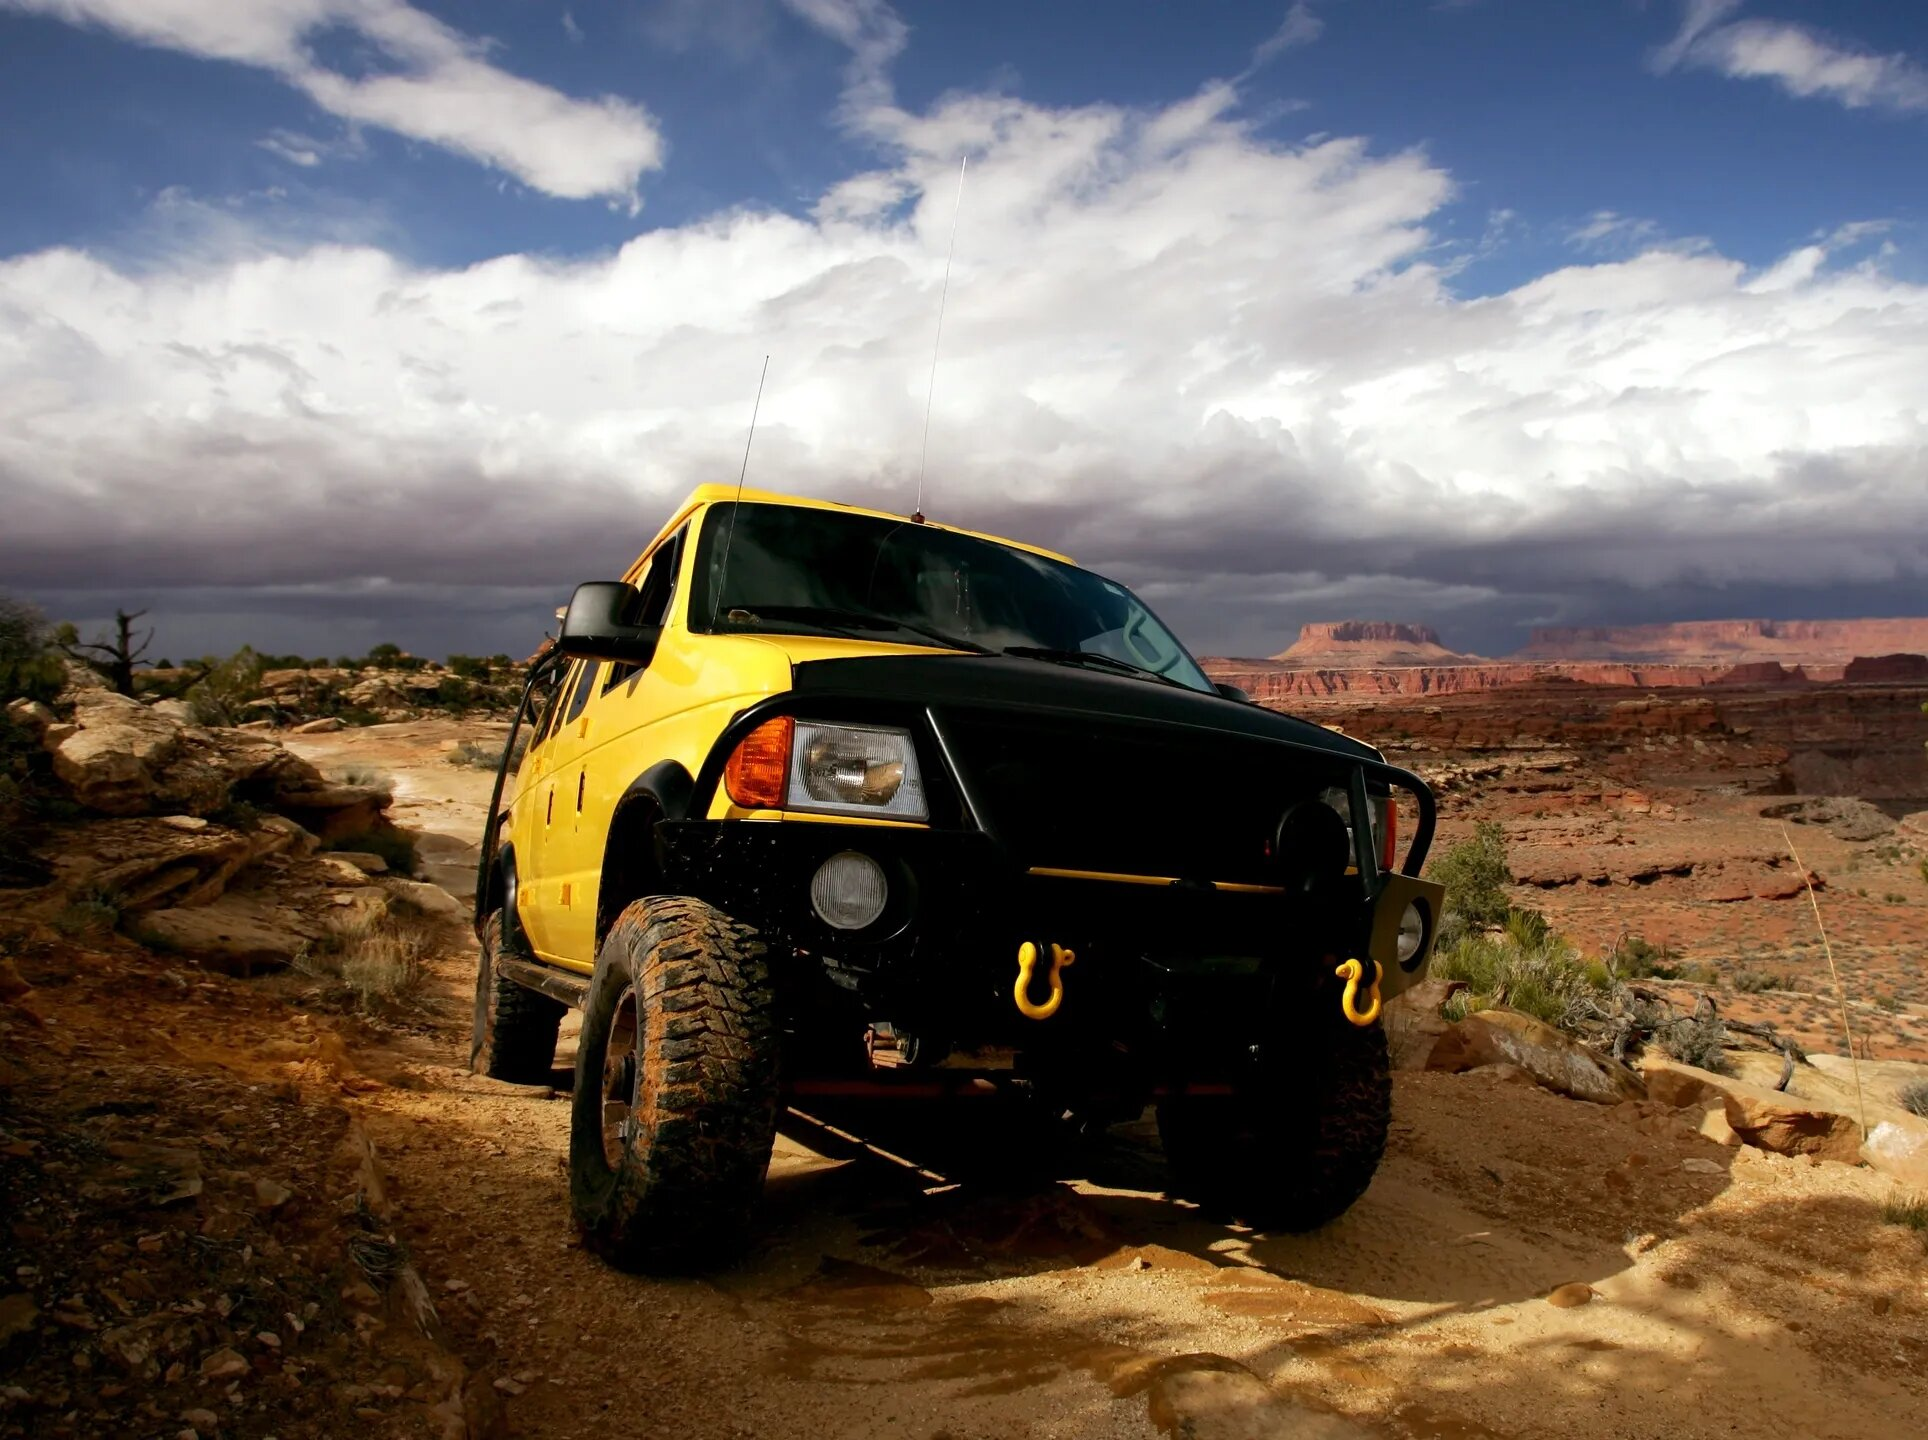 yellow truck on rough terrain